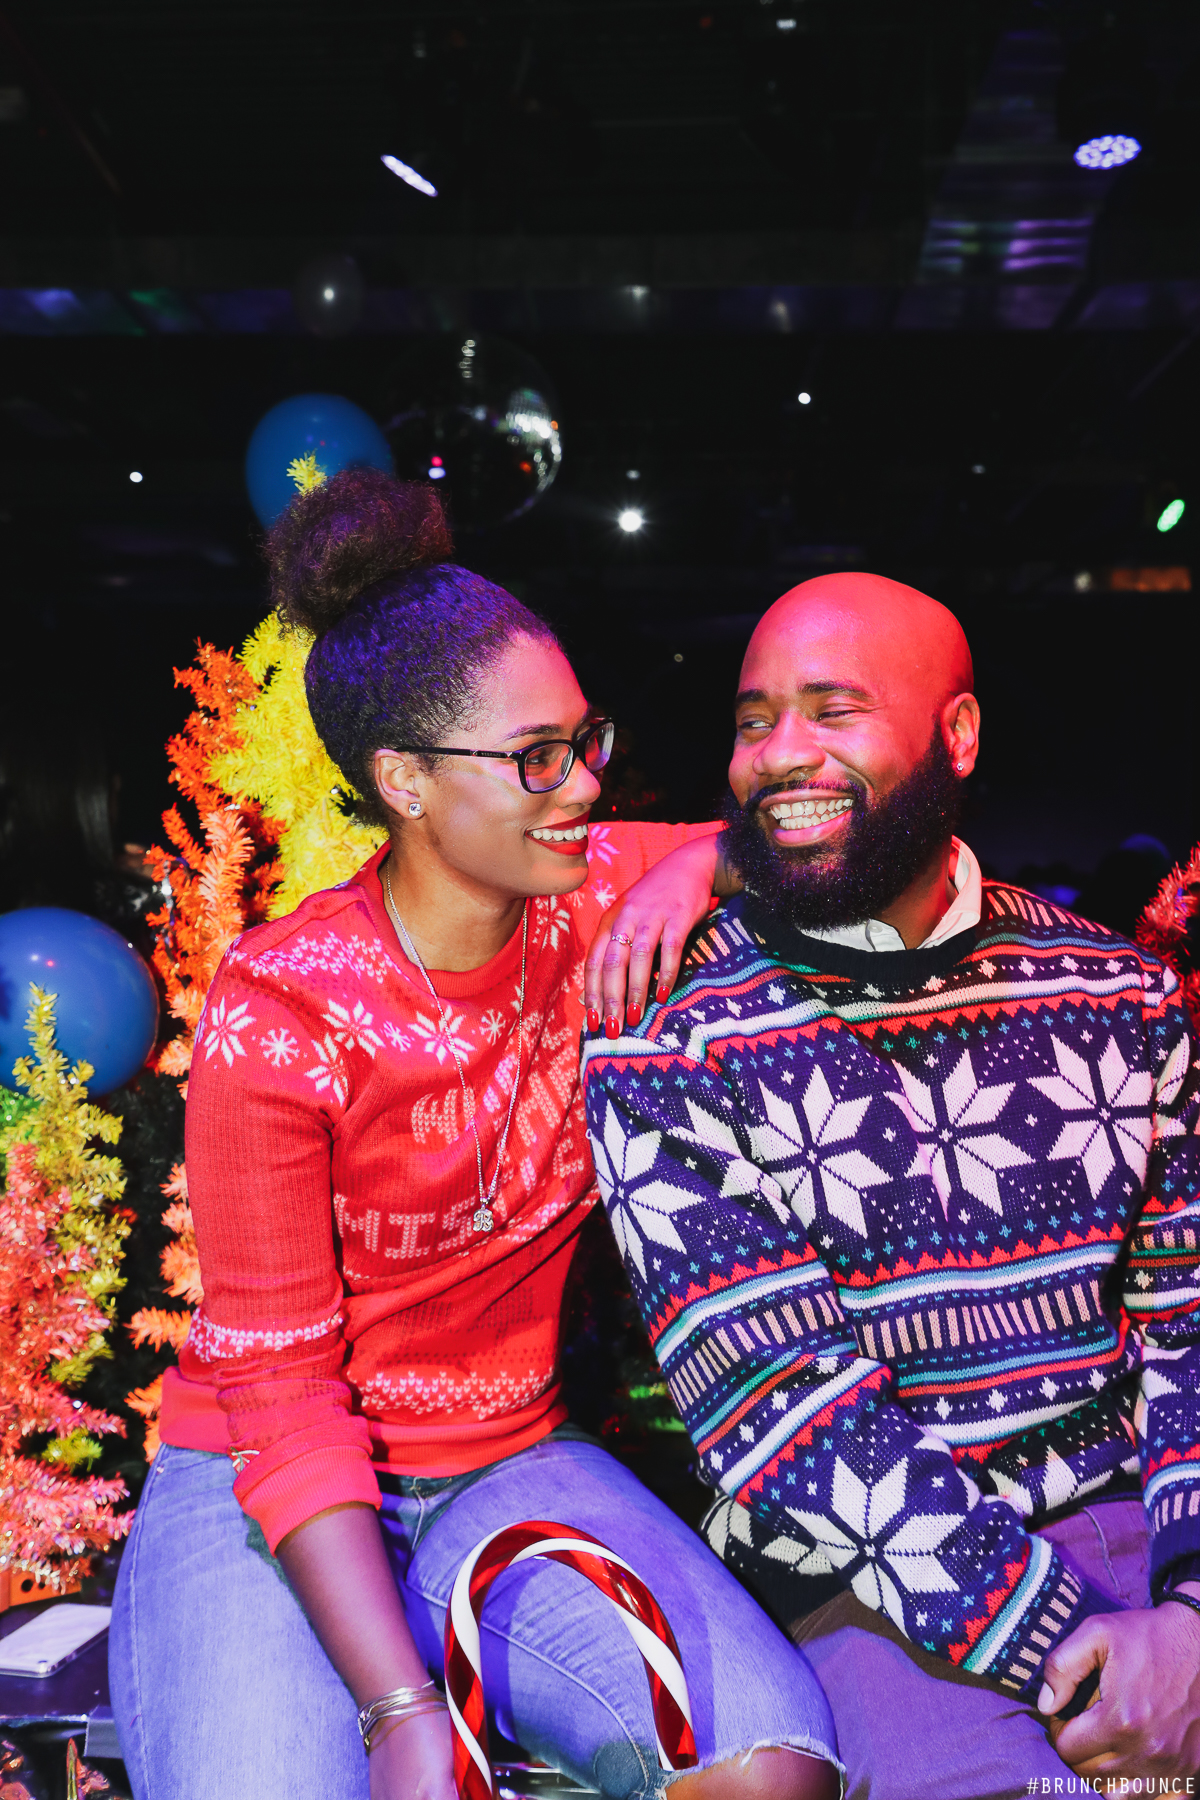 Brunch Bounce Ugly Sweater 2018-142.jpg